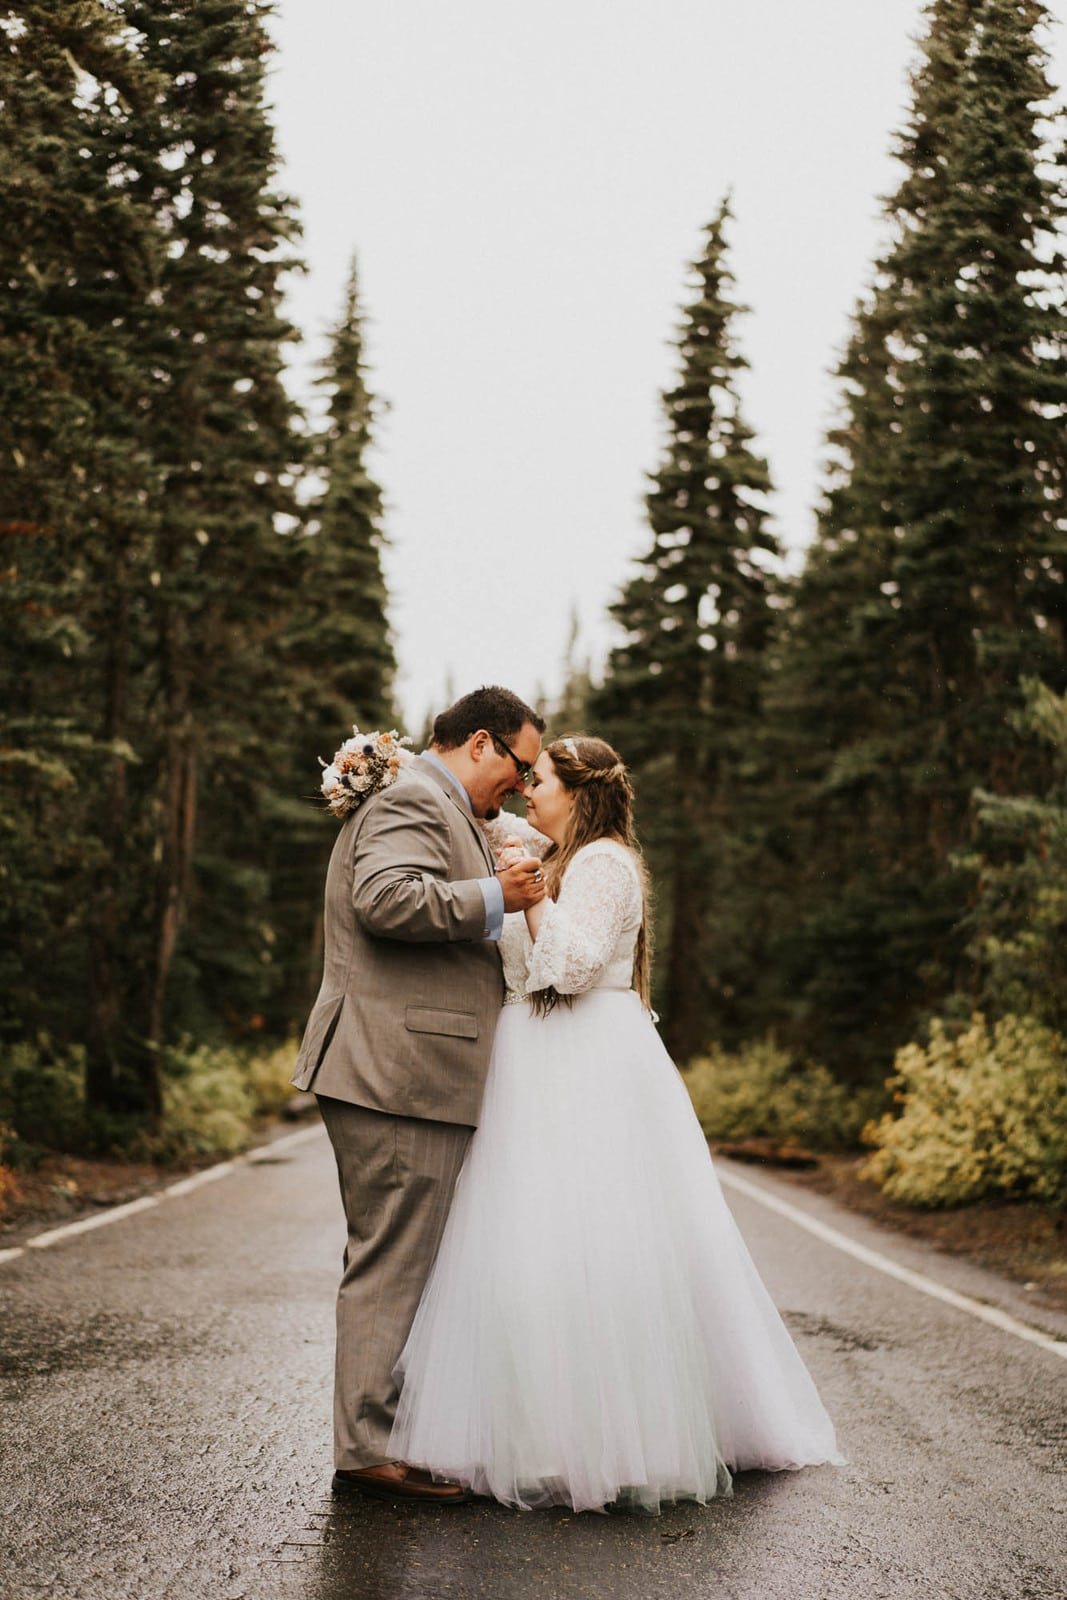 bride and groom slow dancing in the road